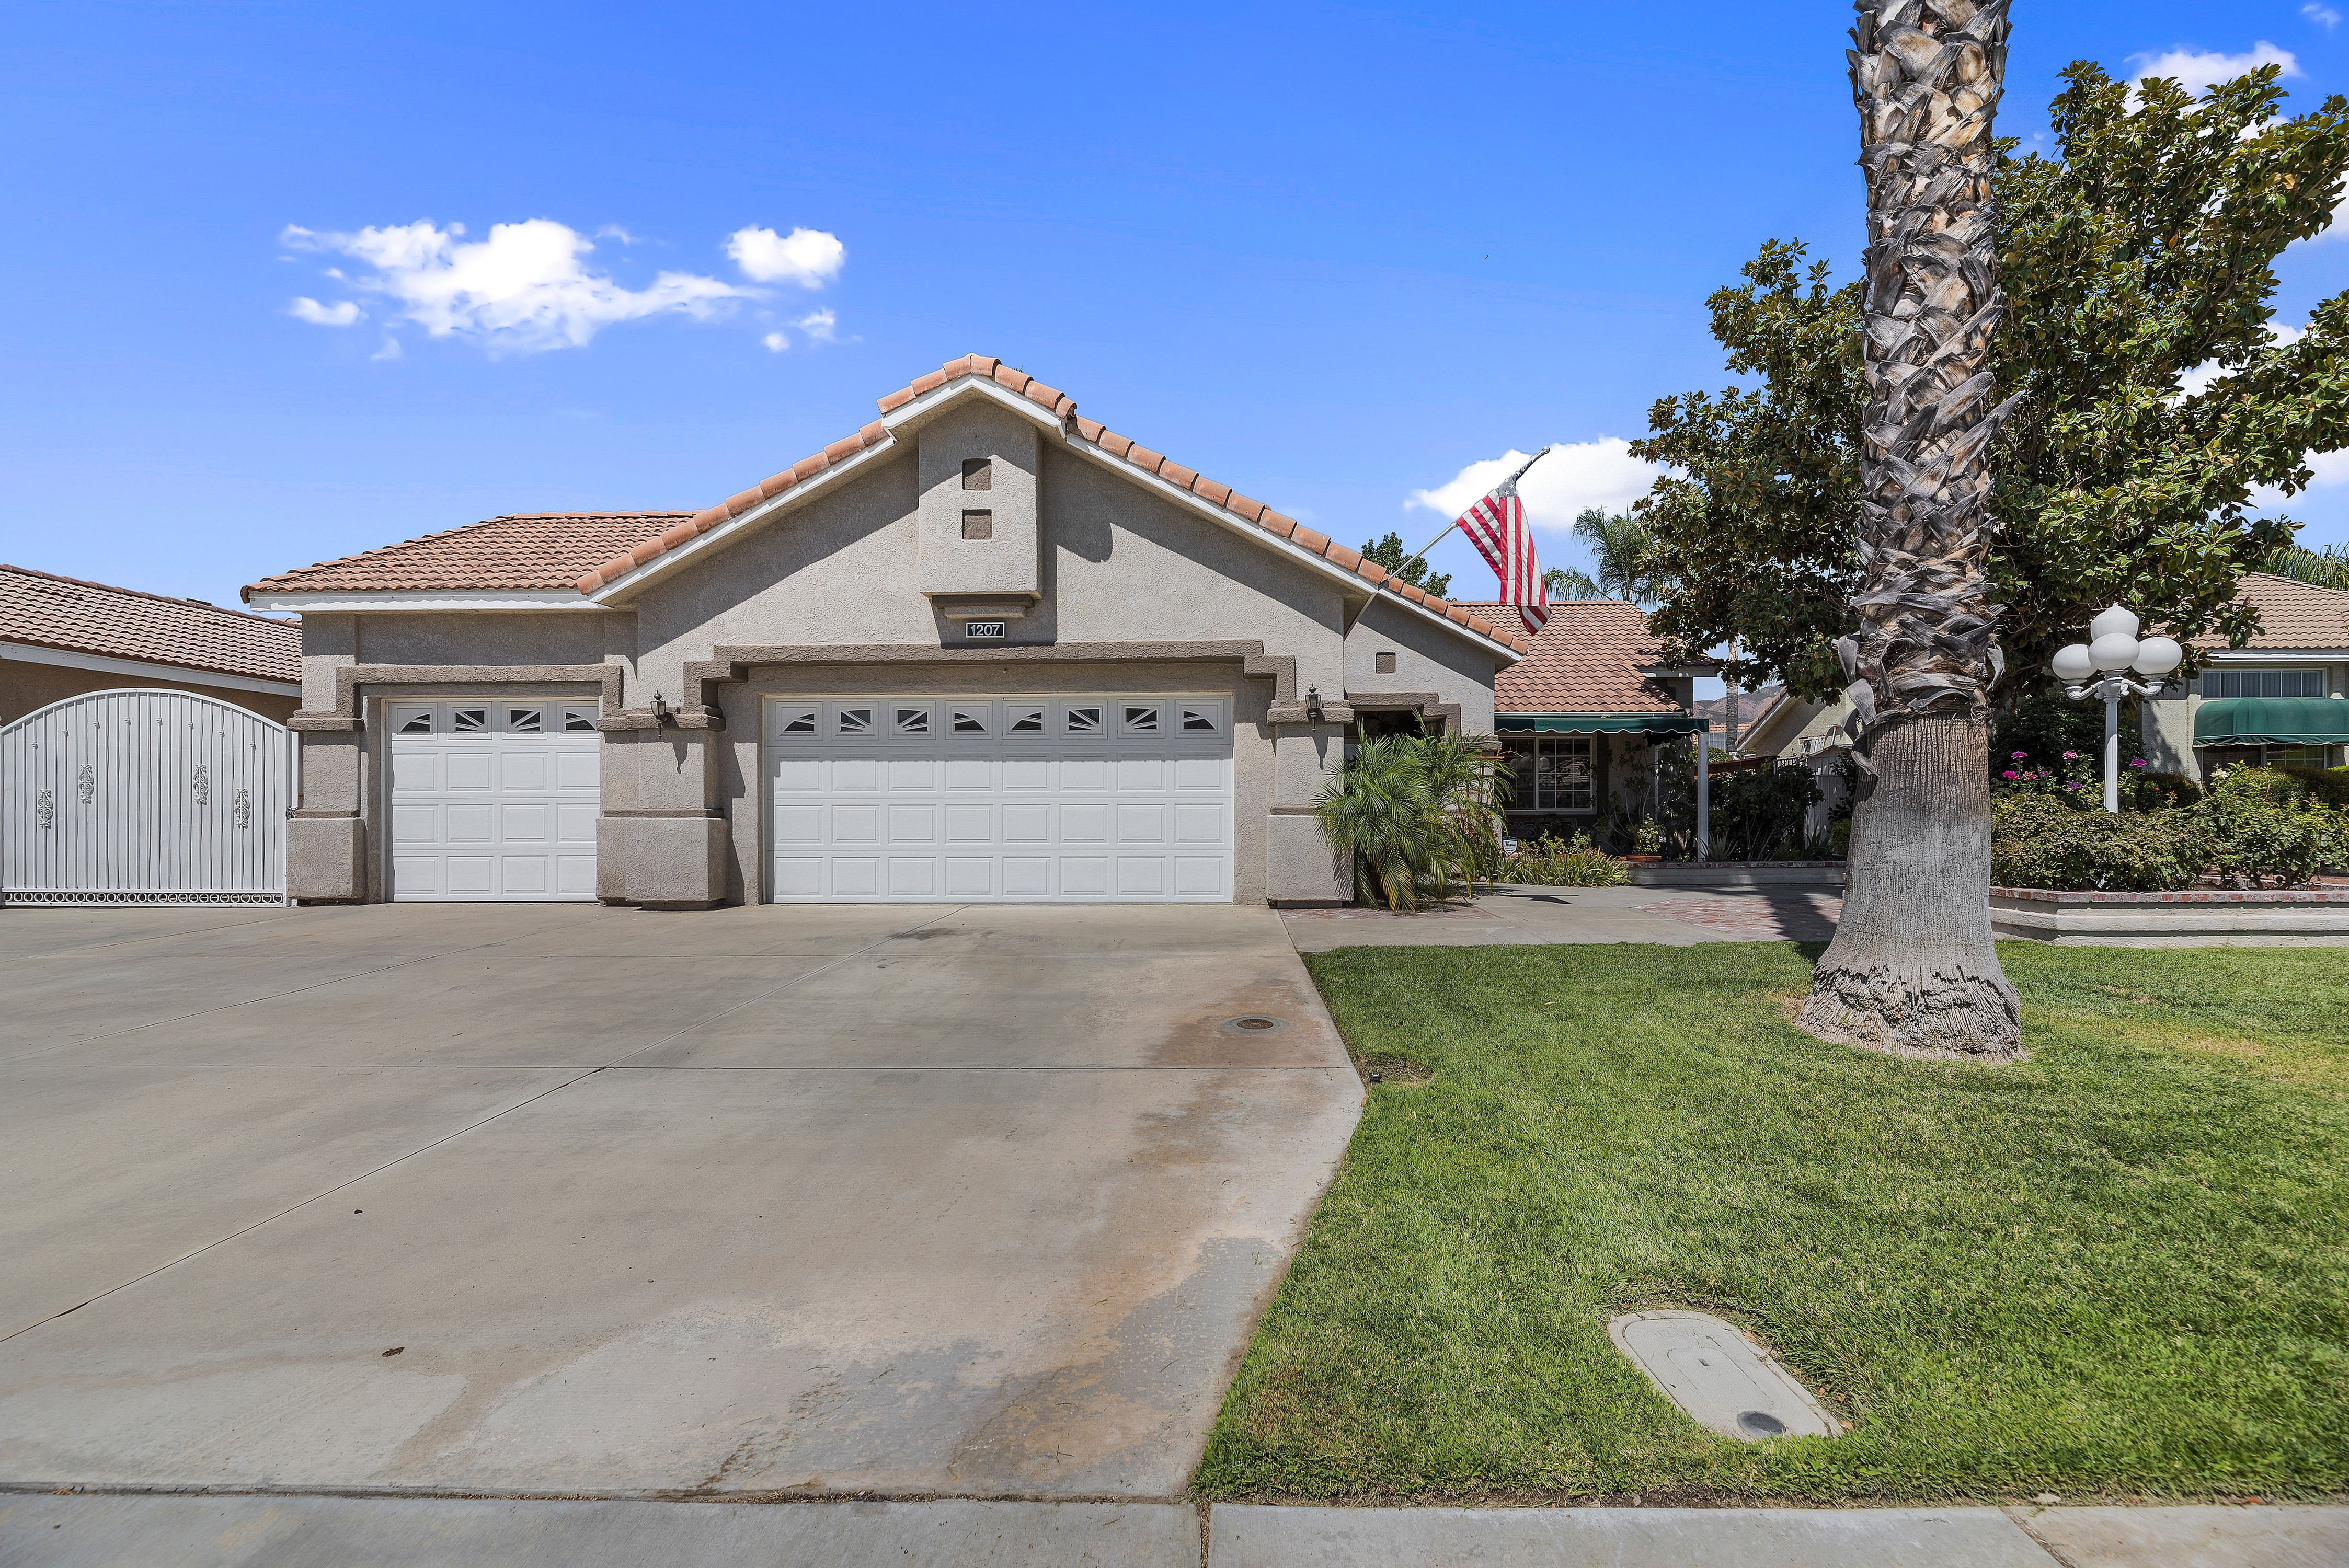 1207 E. Evans St, San Jacinto, California